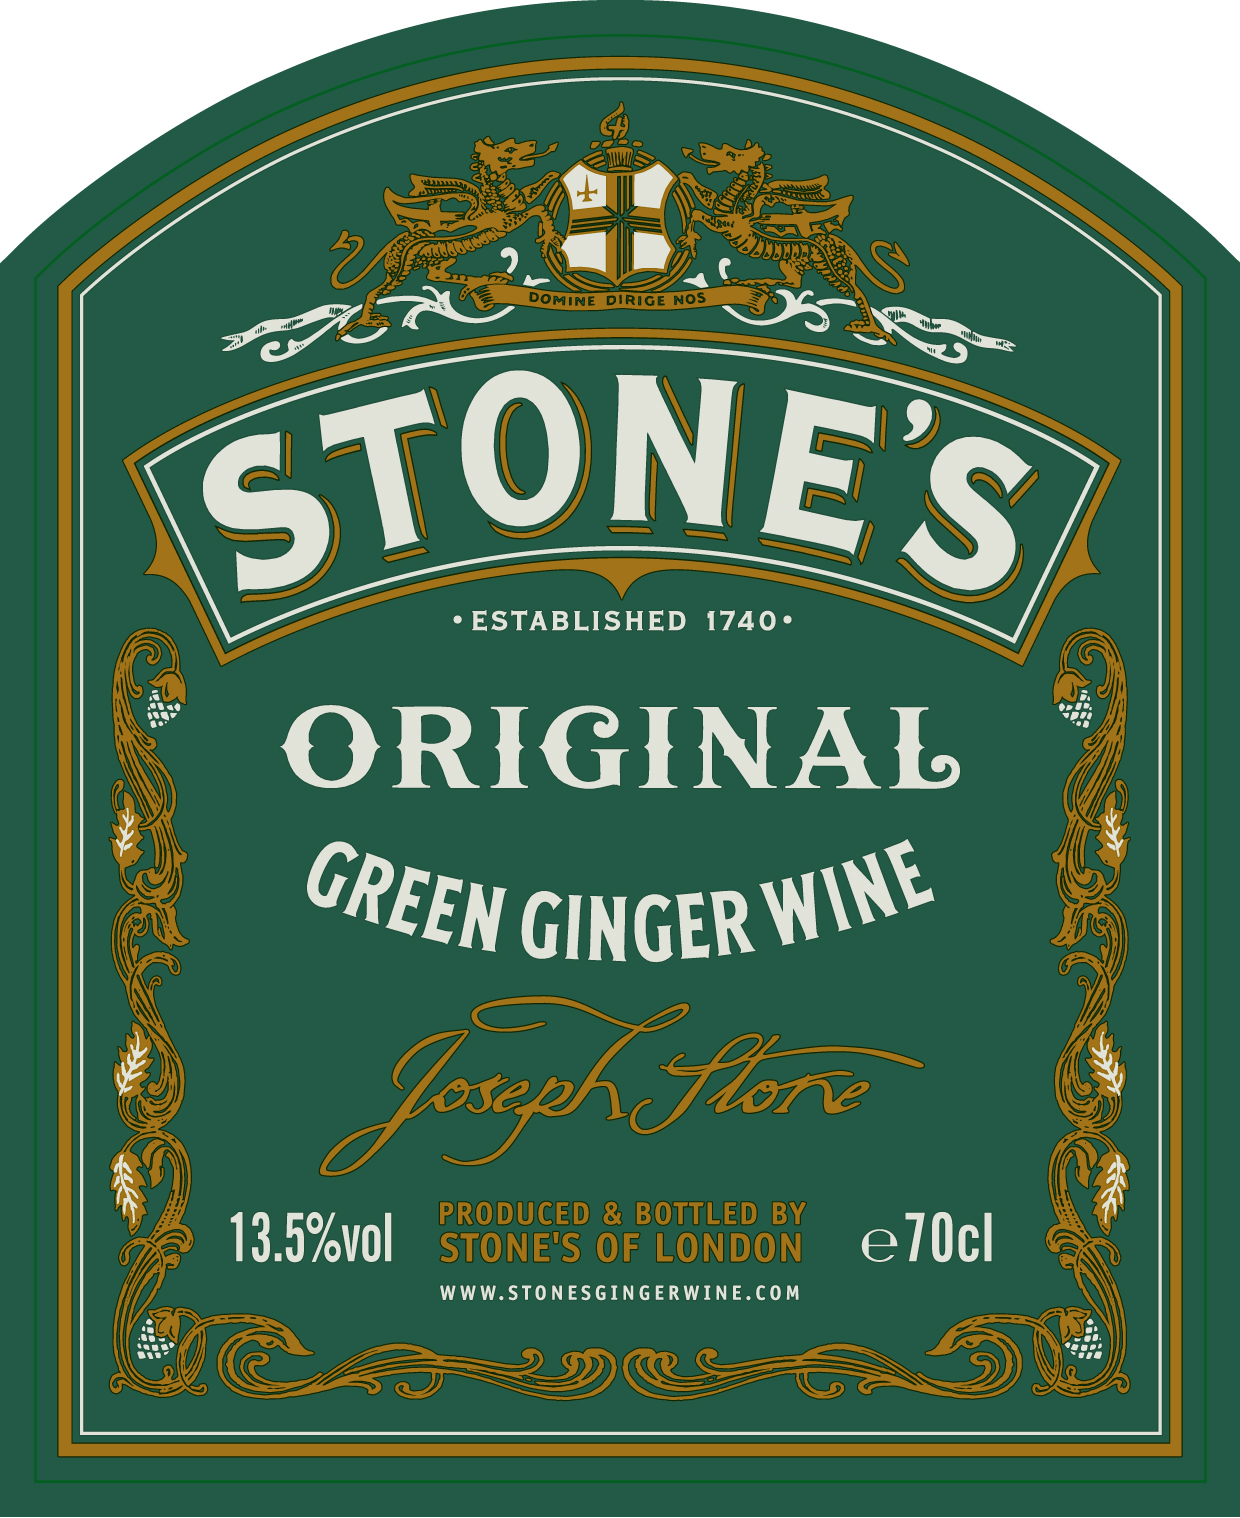 Stones_Label.jpg